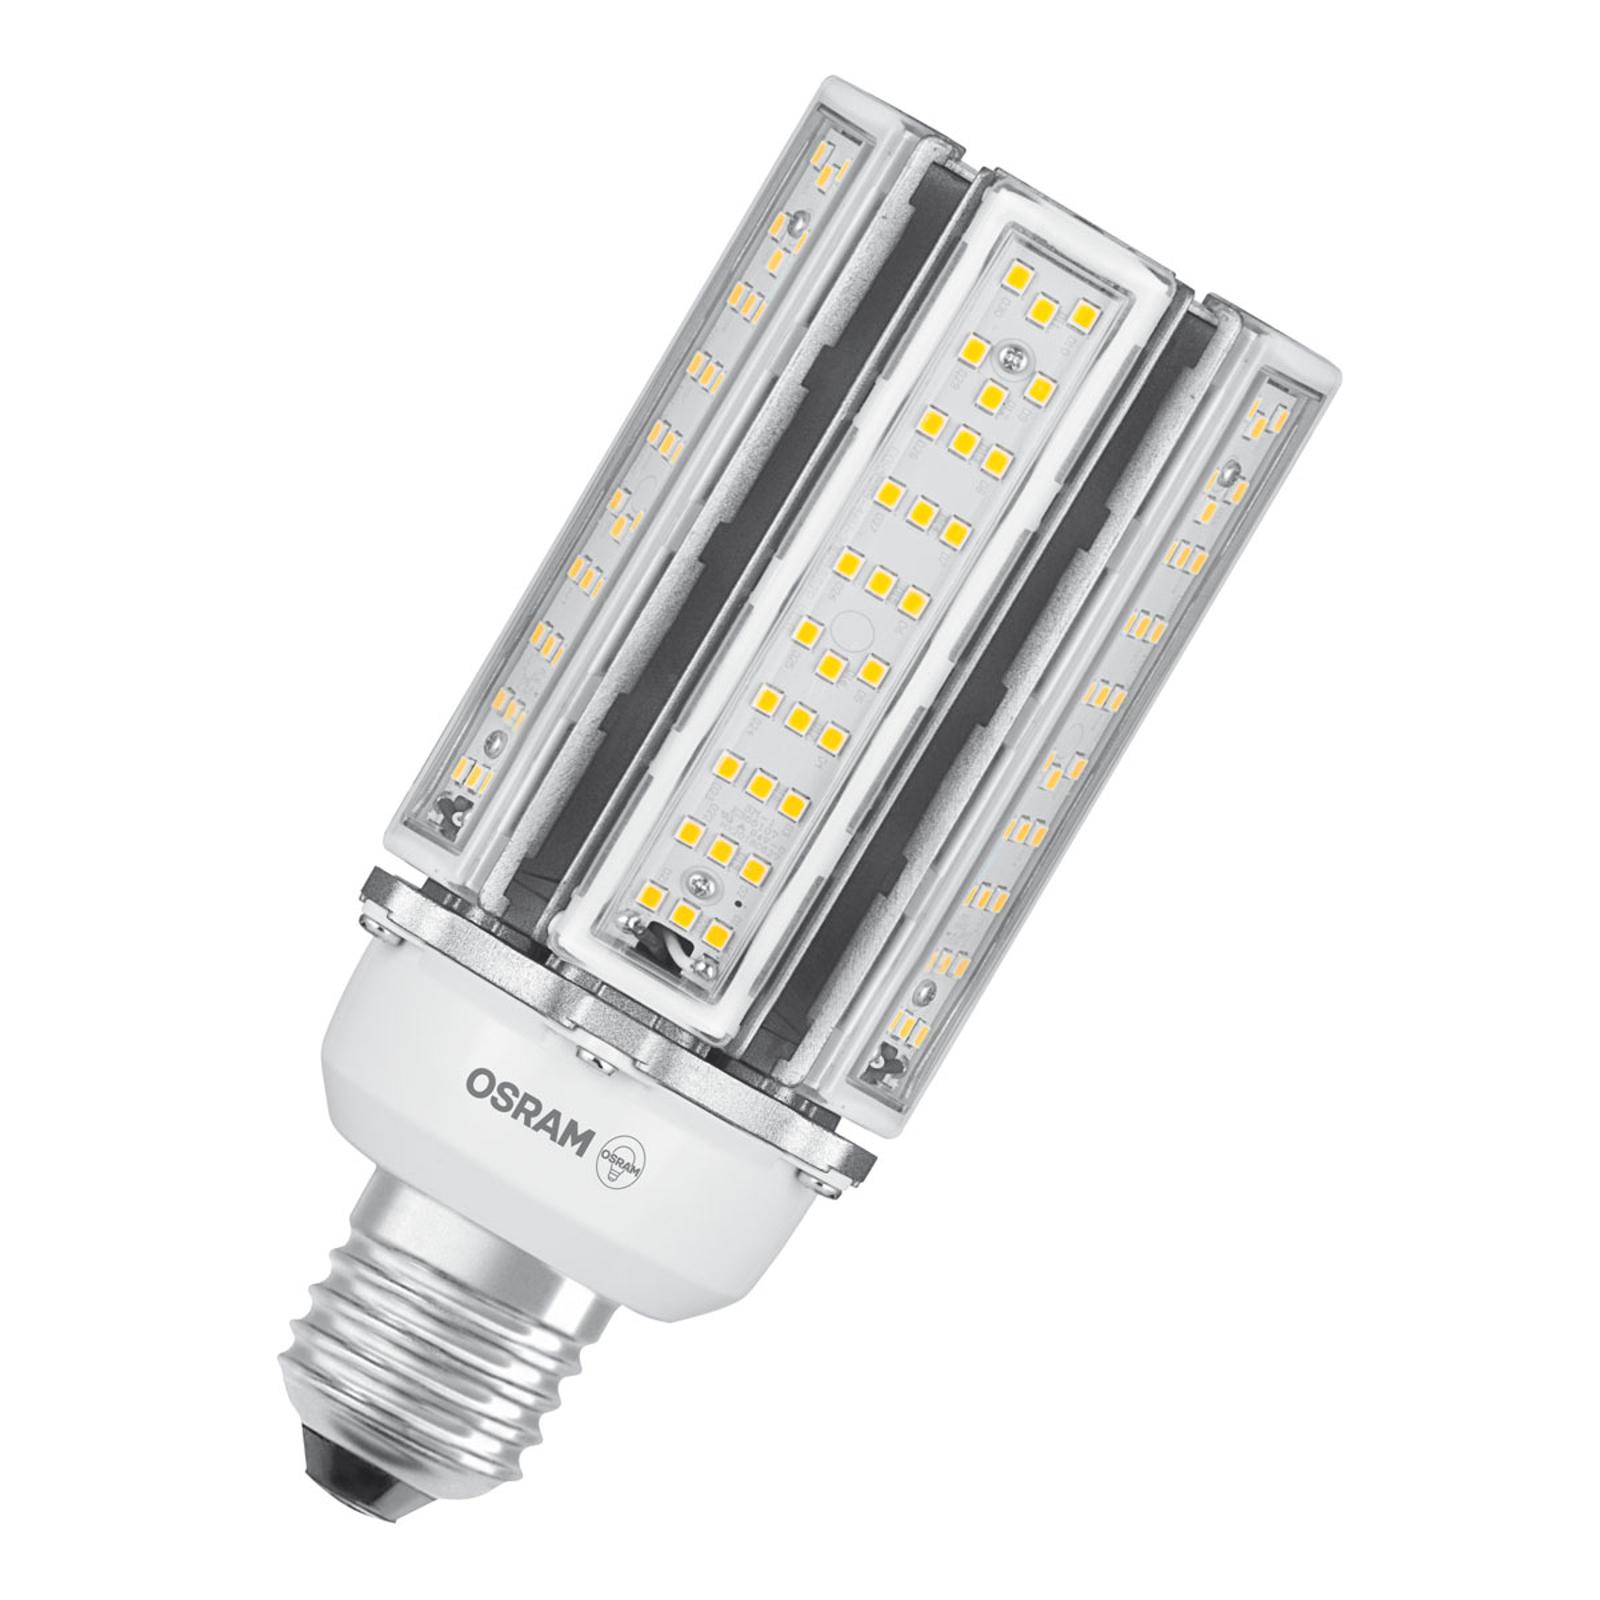 OSRAM-LED-lamppu E40 Parathom HQL 46W 4 000 K